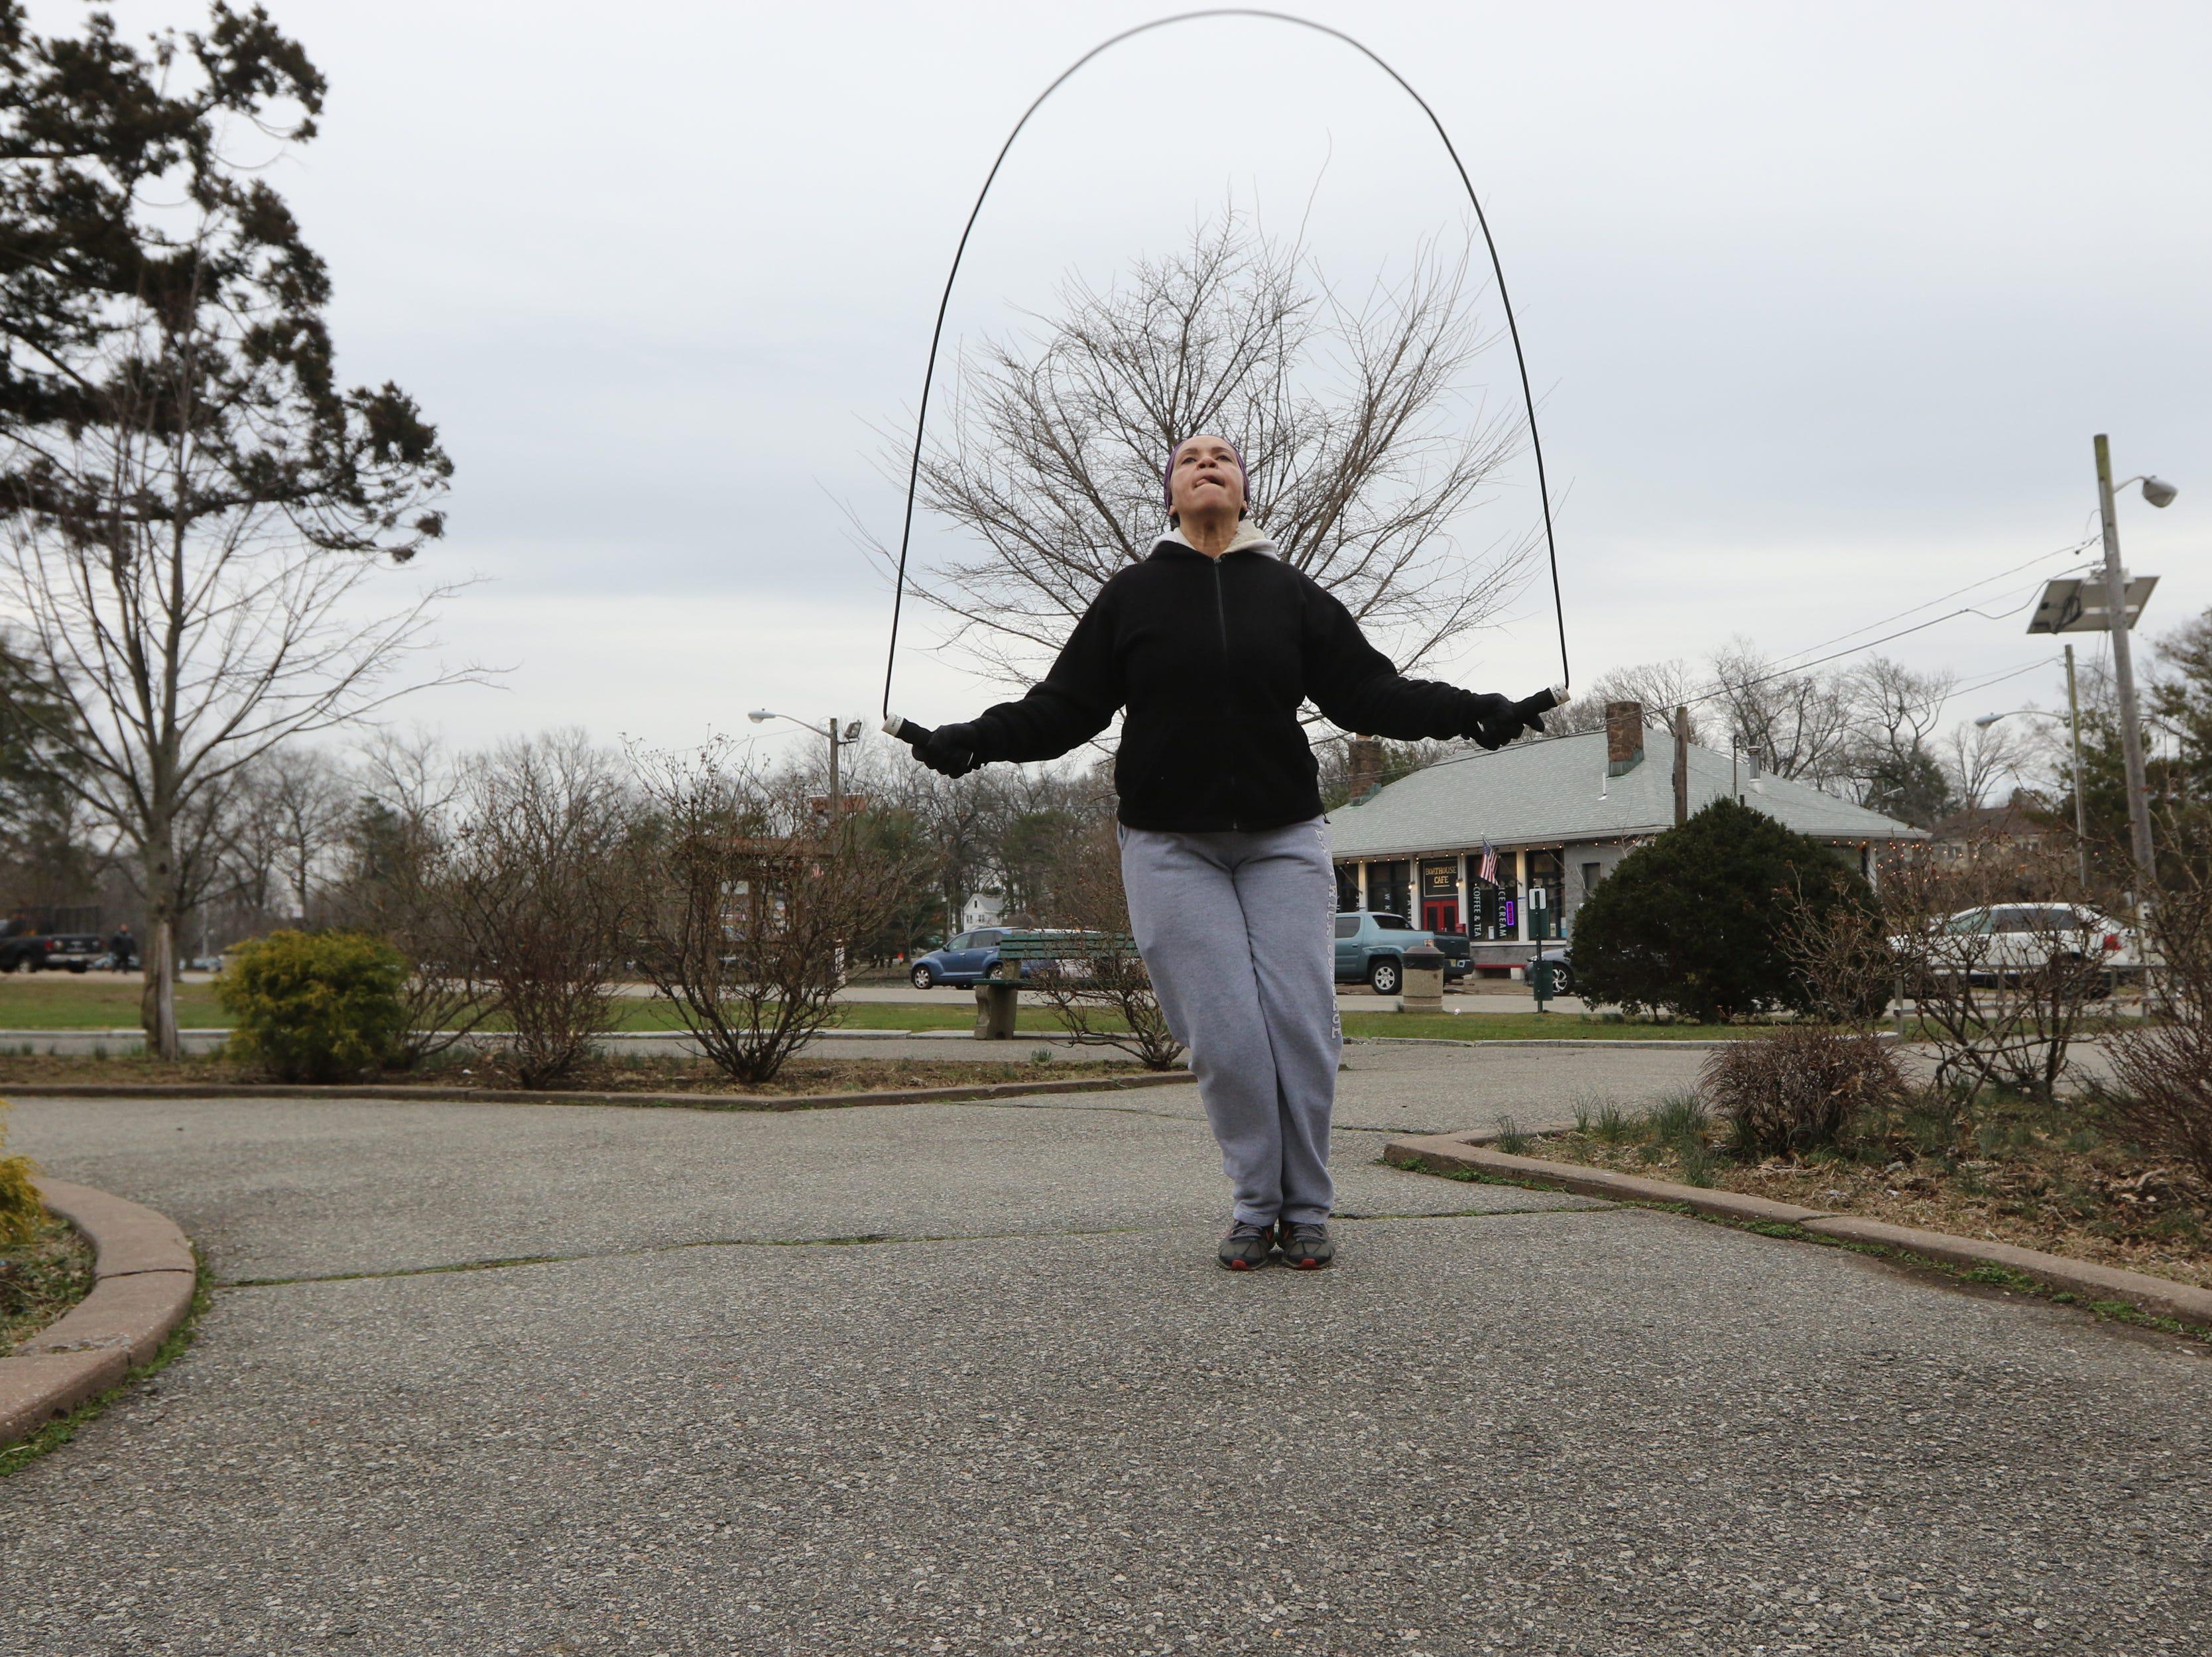 Berkis Baez jumps rope at Third Ward Park, in Passaic. Monday, March 25, 2019